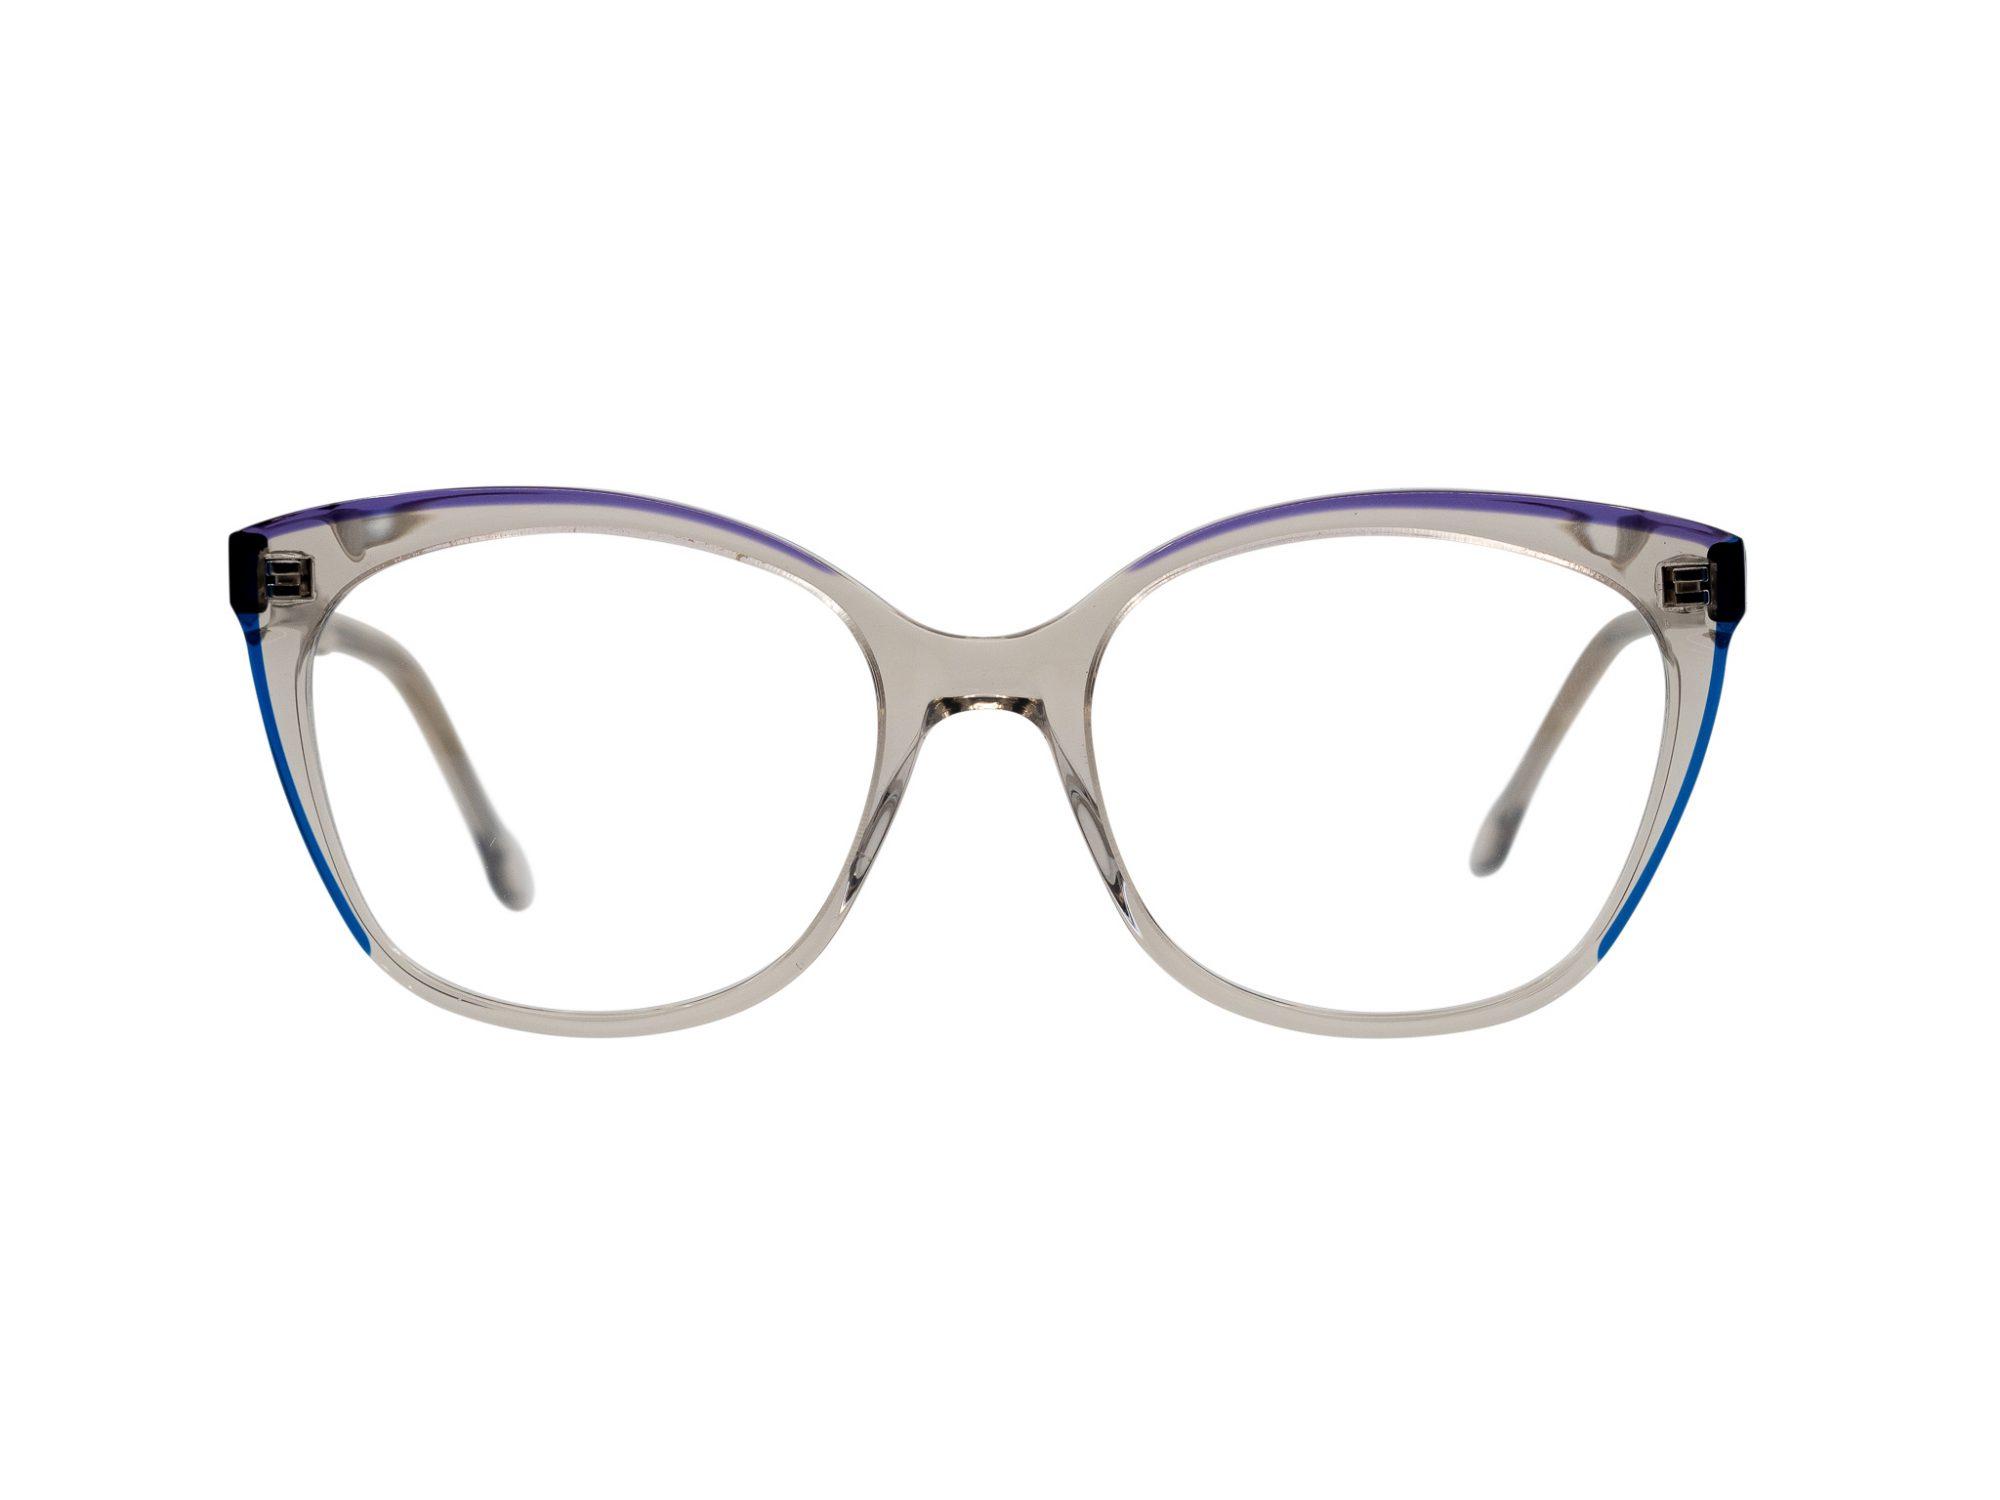 Res/Rei Lavender 581